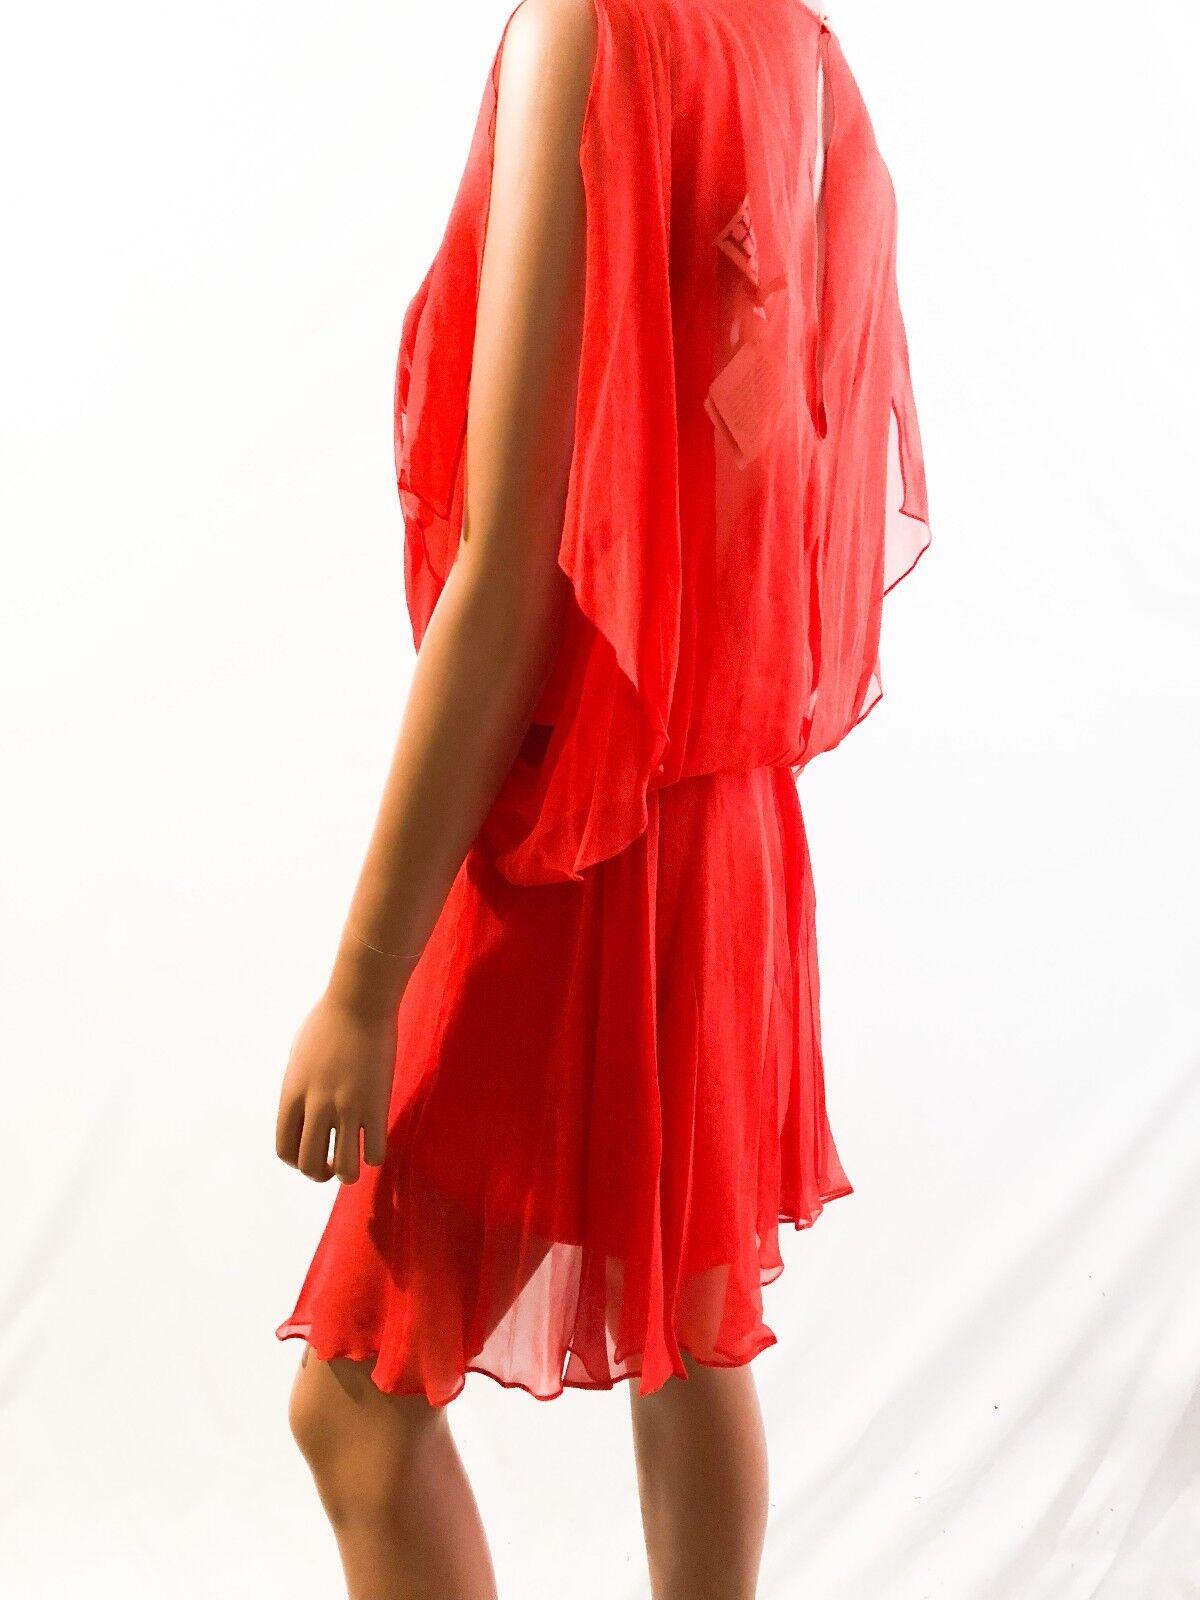 Haute Hippie Applique Applique Applique Embellished Red Silk Dress Tunisian Red SIZE-S d79e02